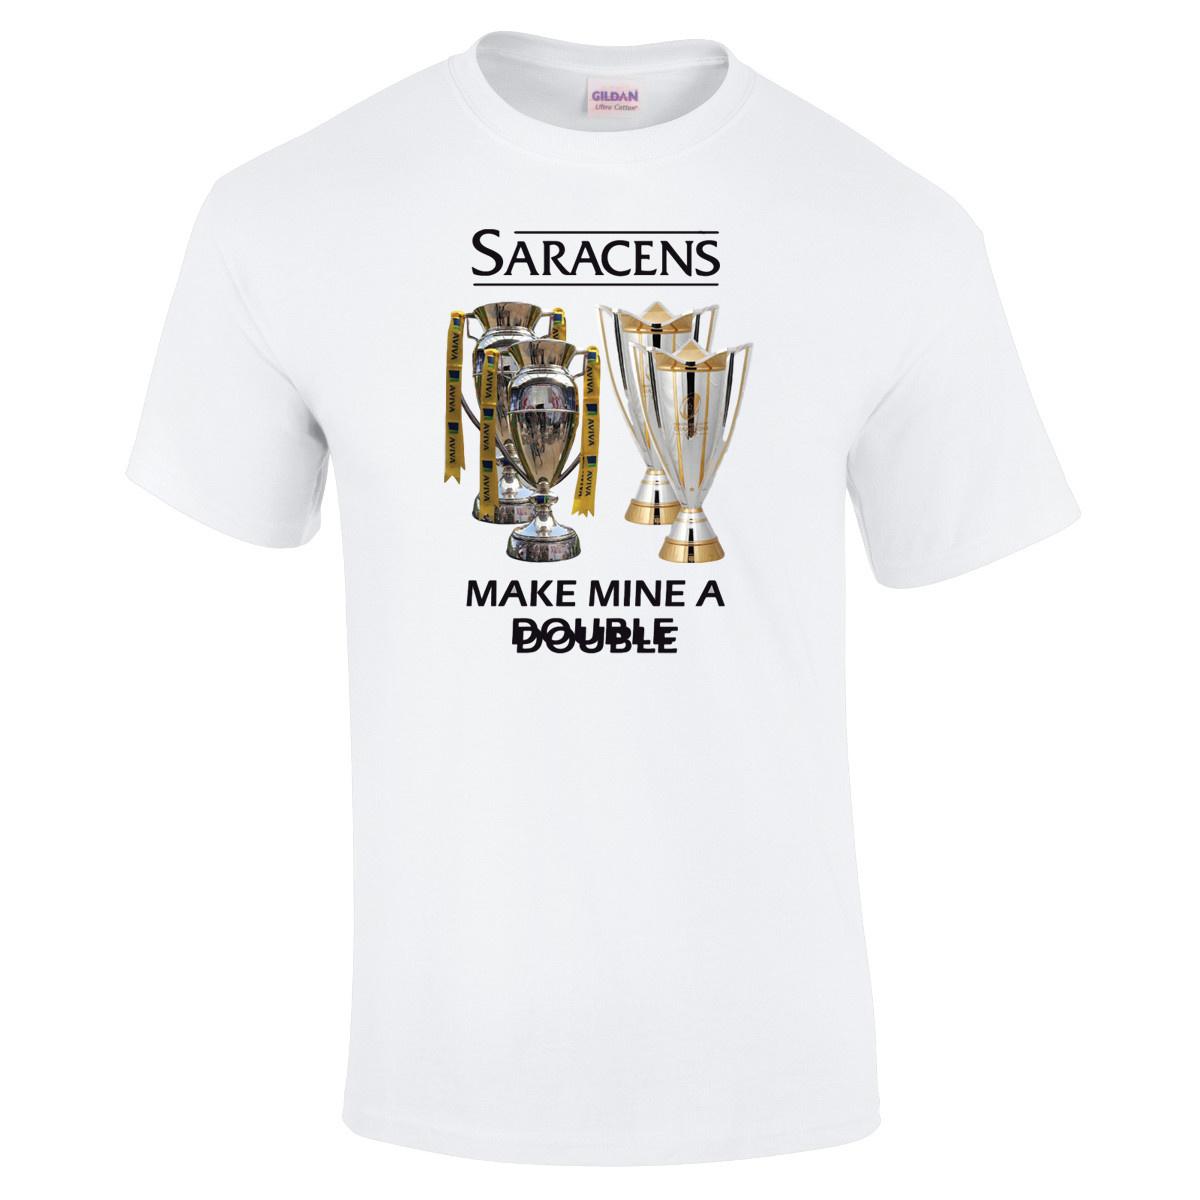 Premium Force Saracens Adult Make Mine A Double T Shirt